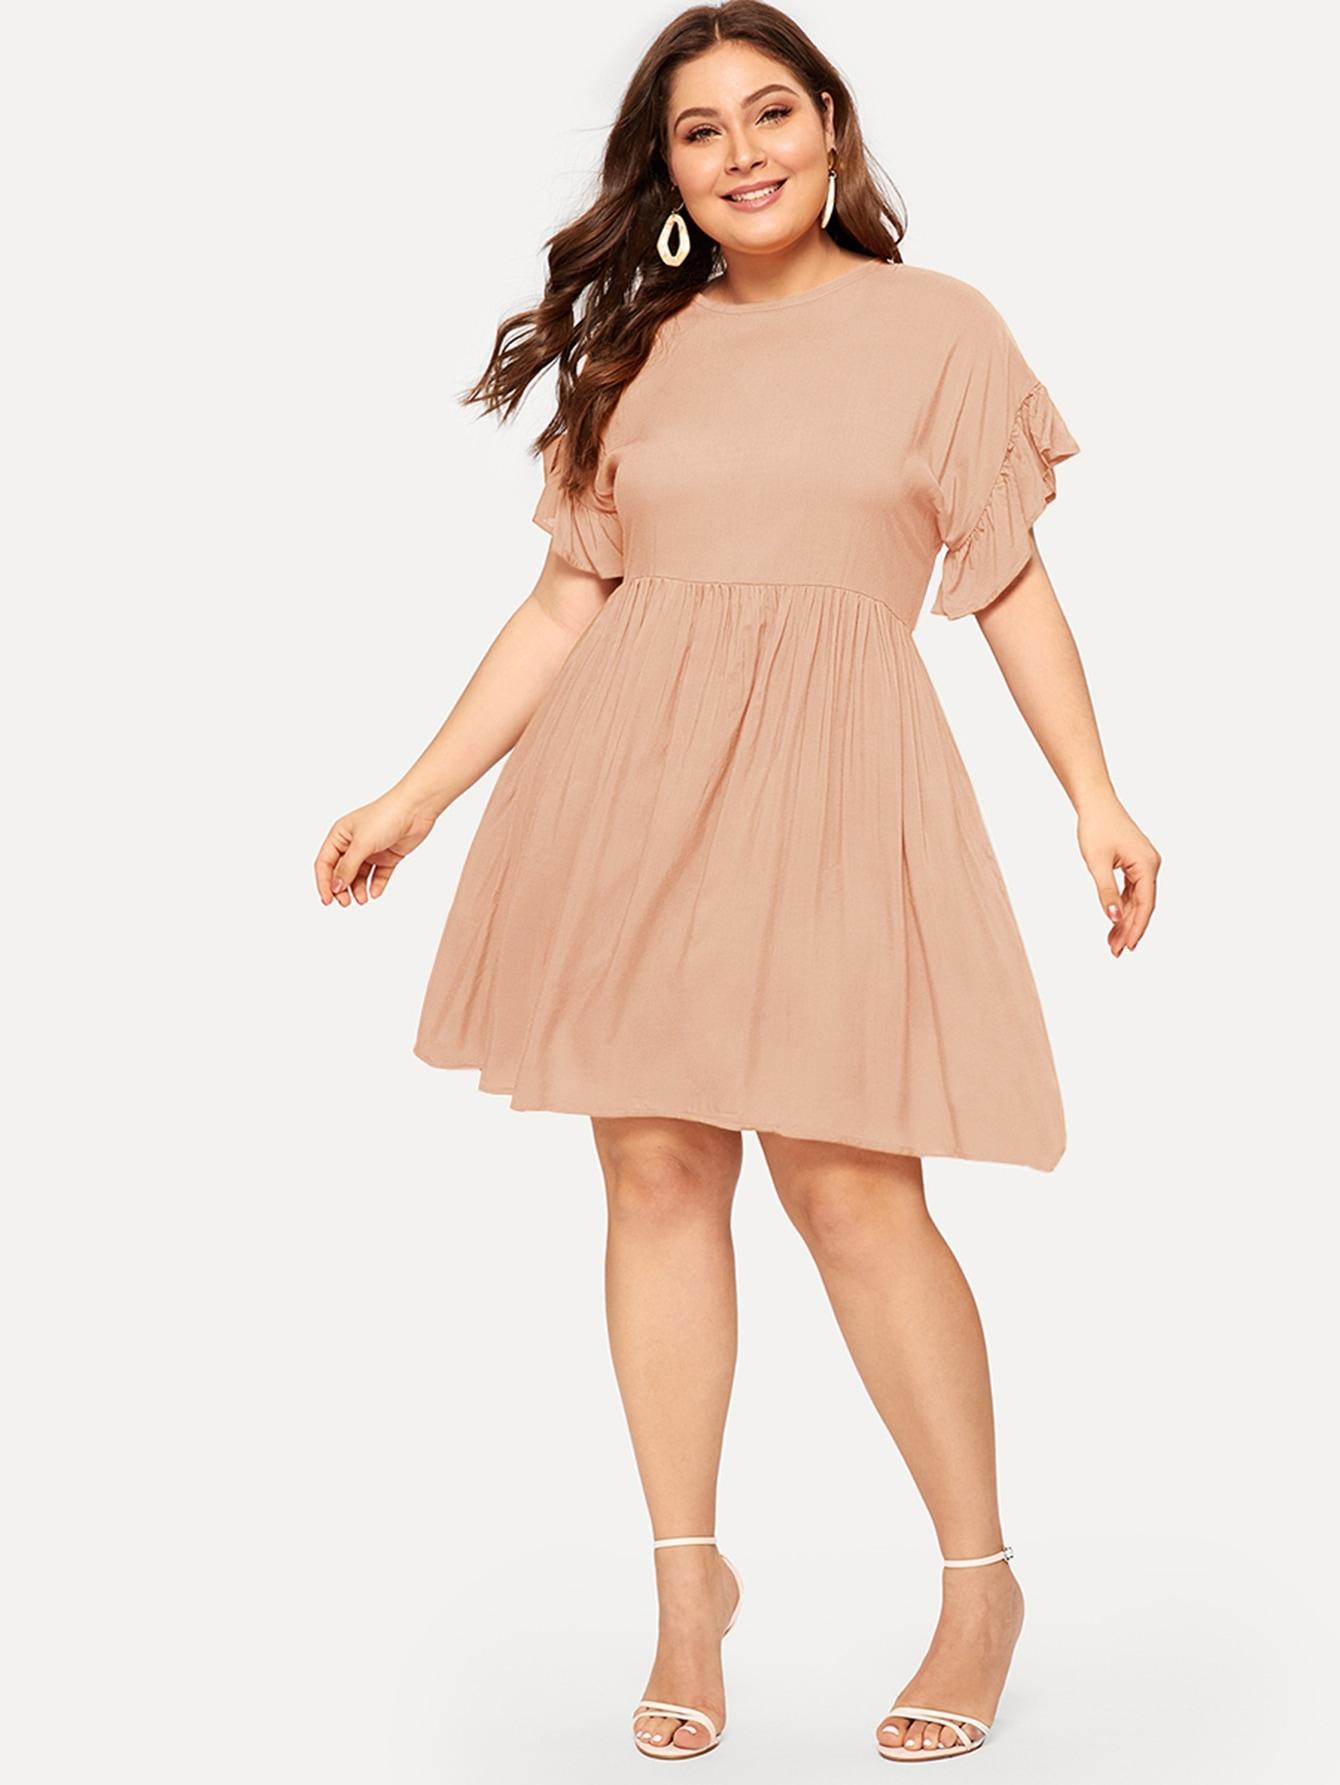 Размер плюс платье с оборками на манжетах